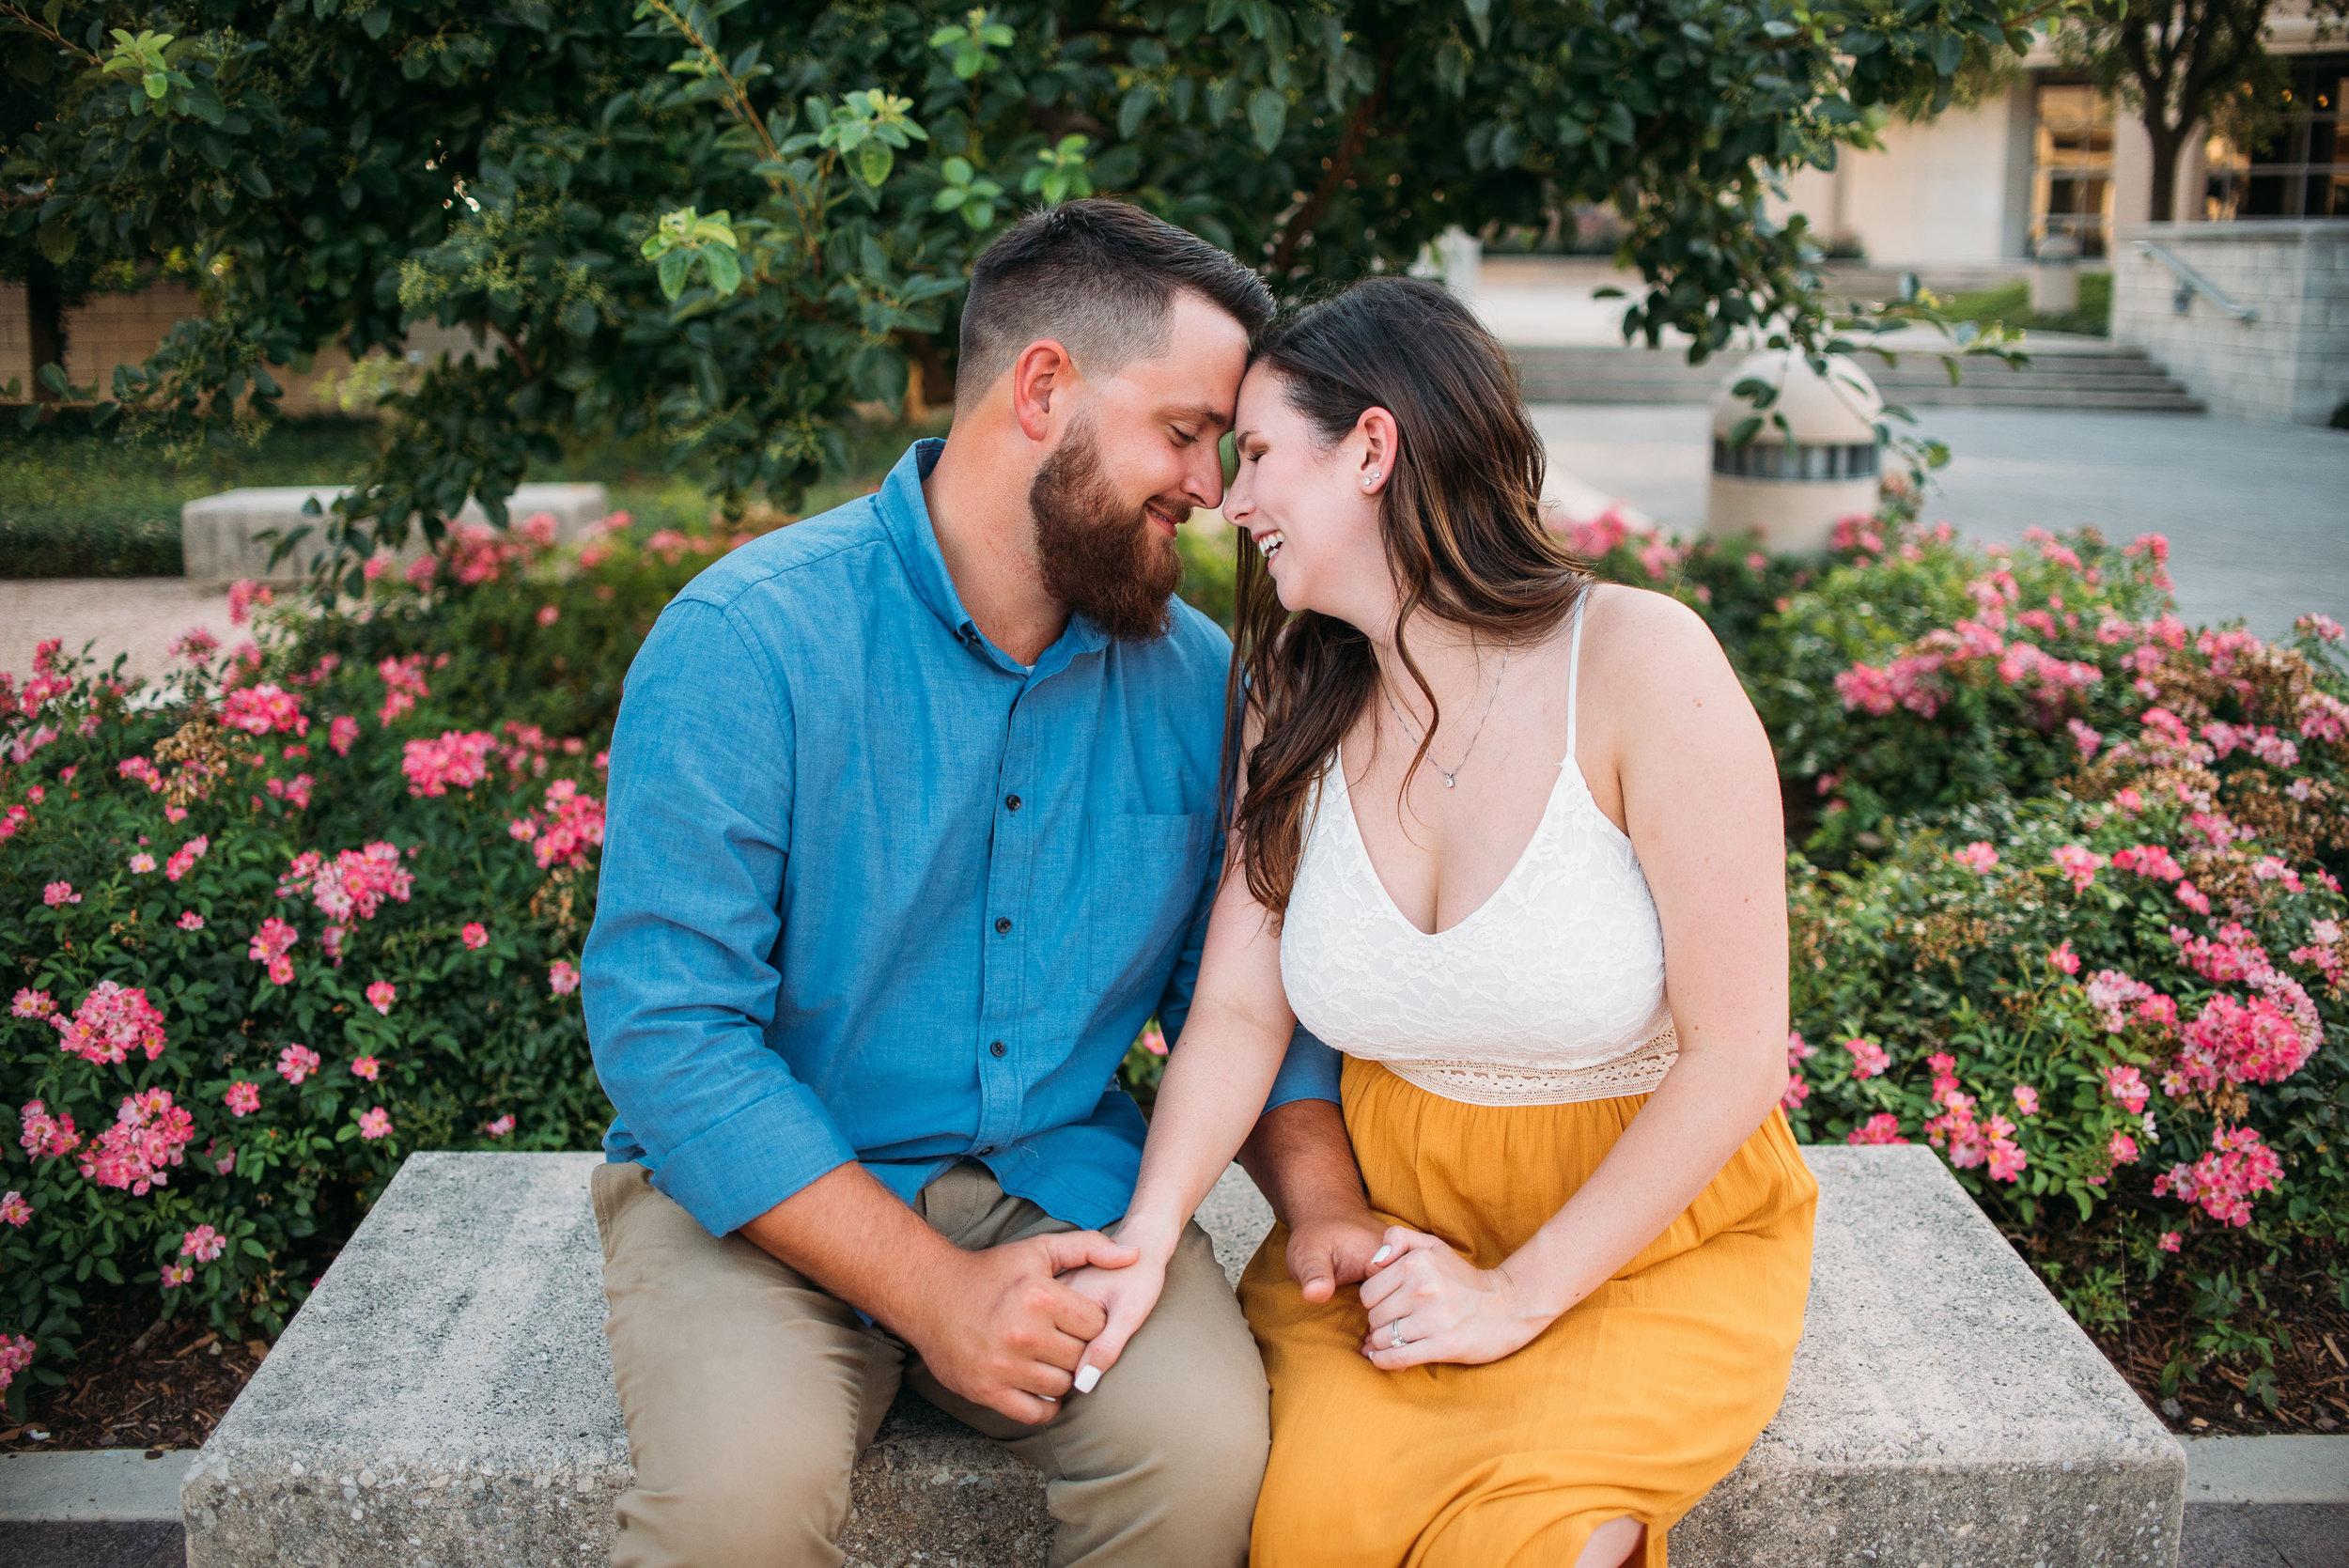 George-Bush-Library-Texas-A&M-University-Engagement-College-Station-Wedding-Photographer-San-Angel-Photo-Mark-Jenna-Matt-Century-Tree-17.jpg